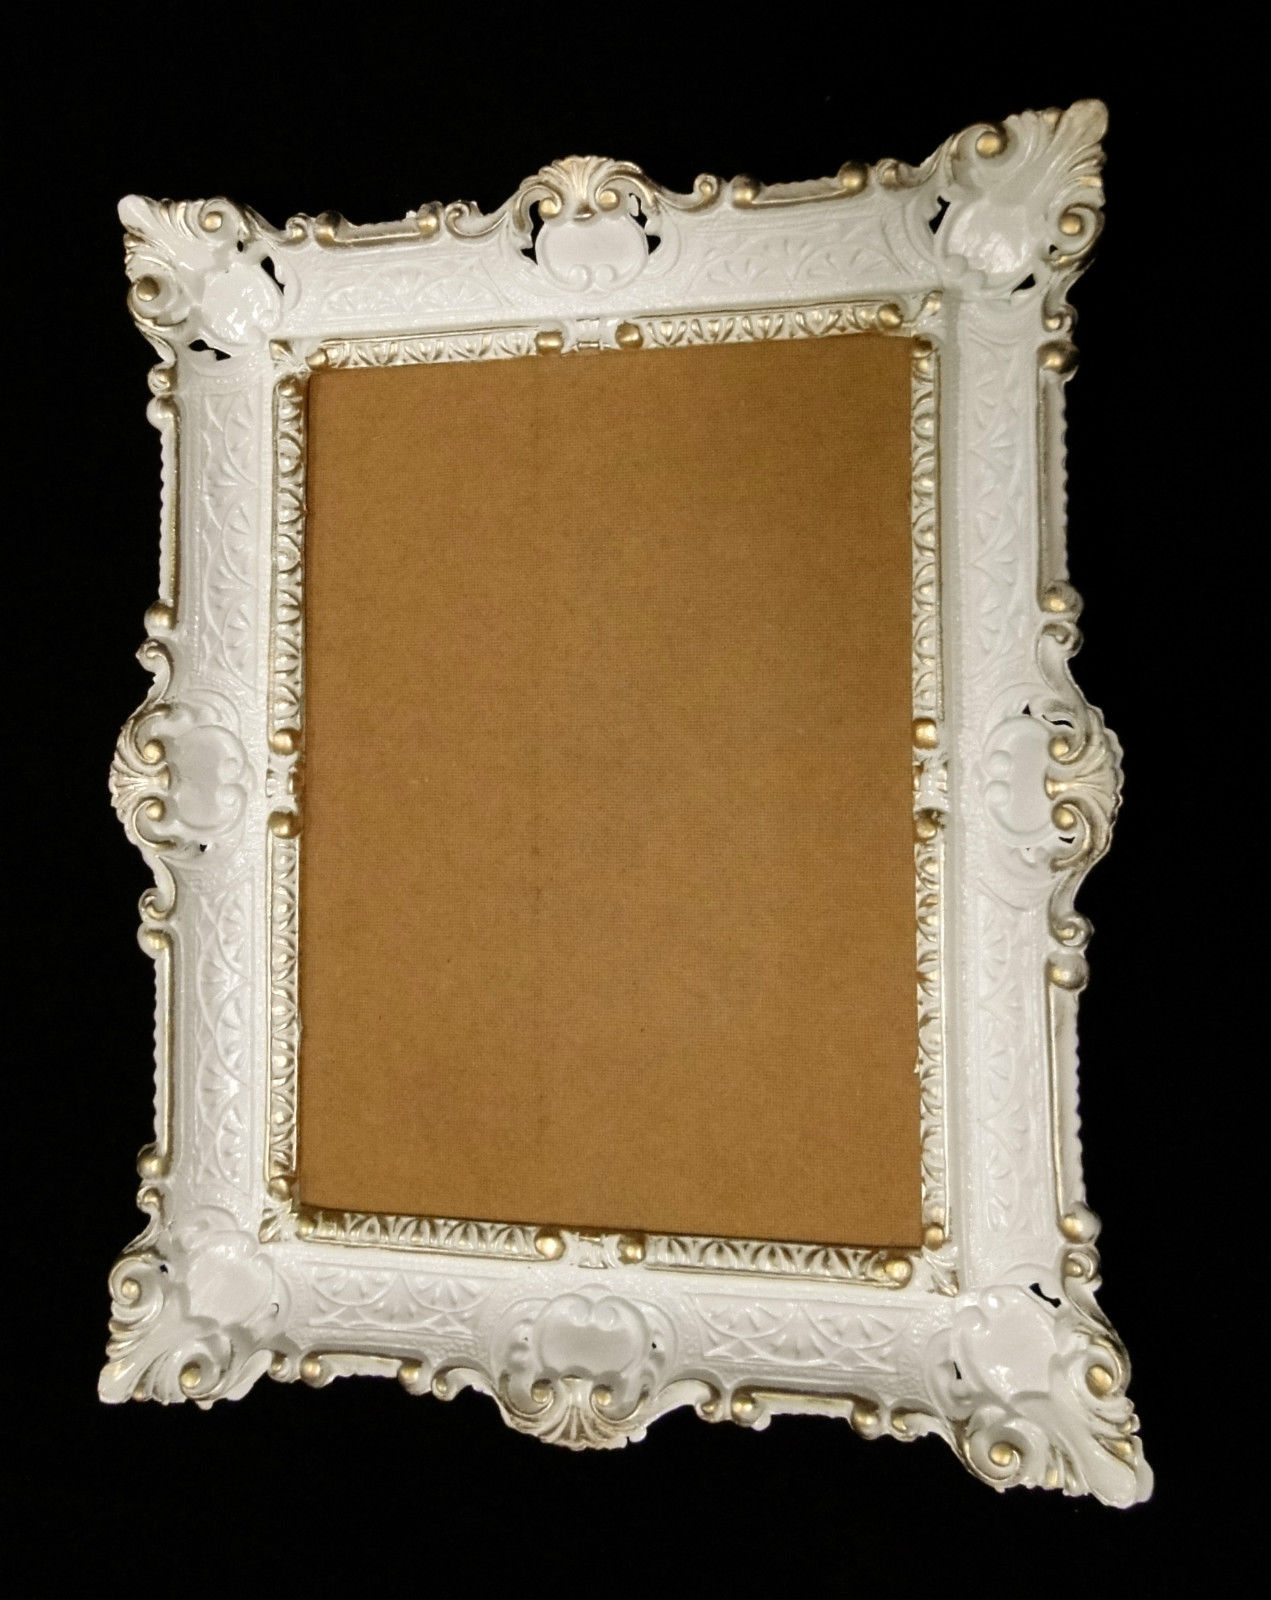 bilderrahmen wei gold vintage shabby chic barock edel retro 56x46 kaufen bei pintici. Black Bedroom Furniture Sets. Home Design Ideas